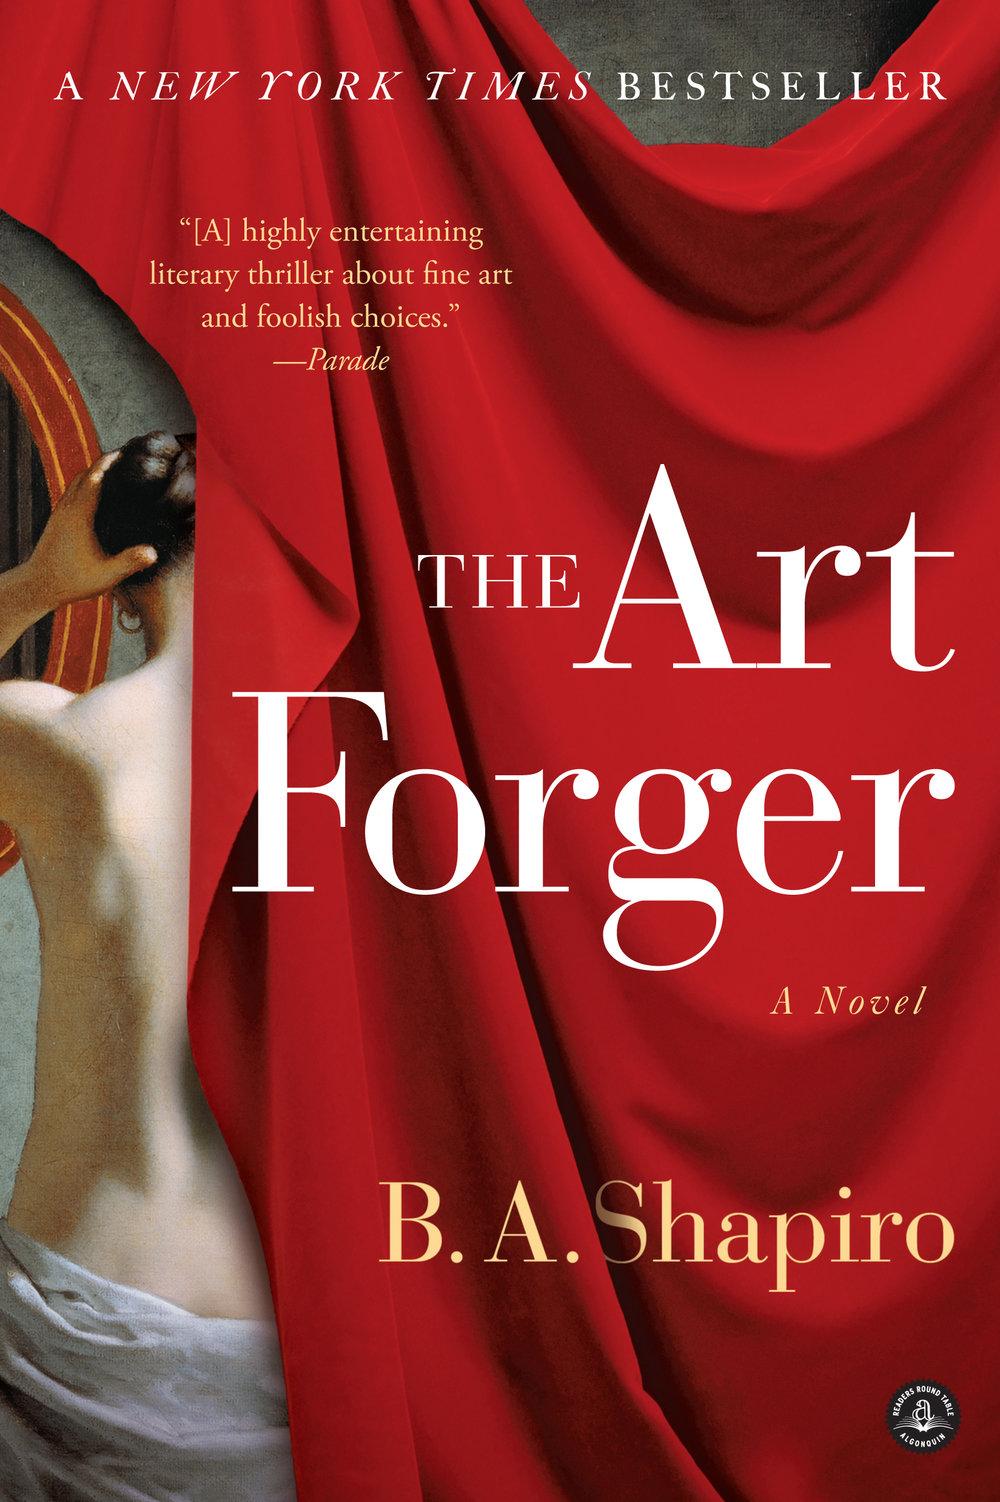 the art forger by b a shapiro.jpg